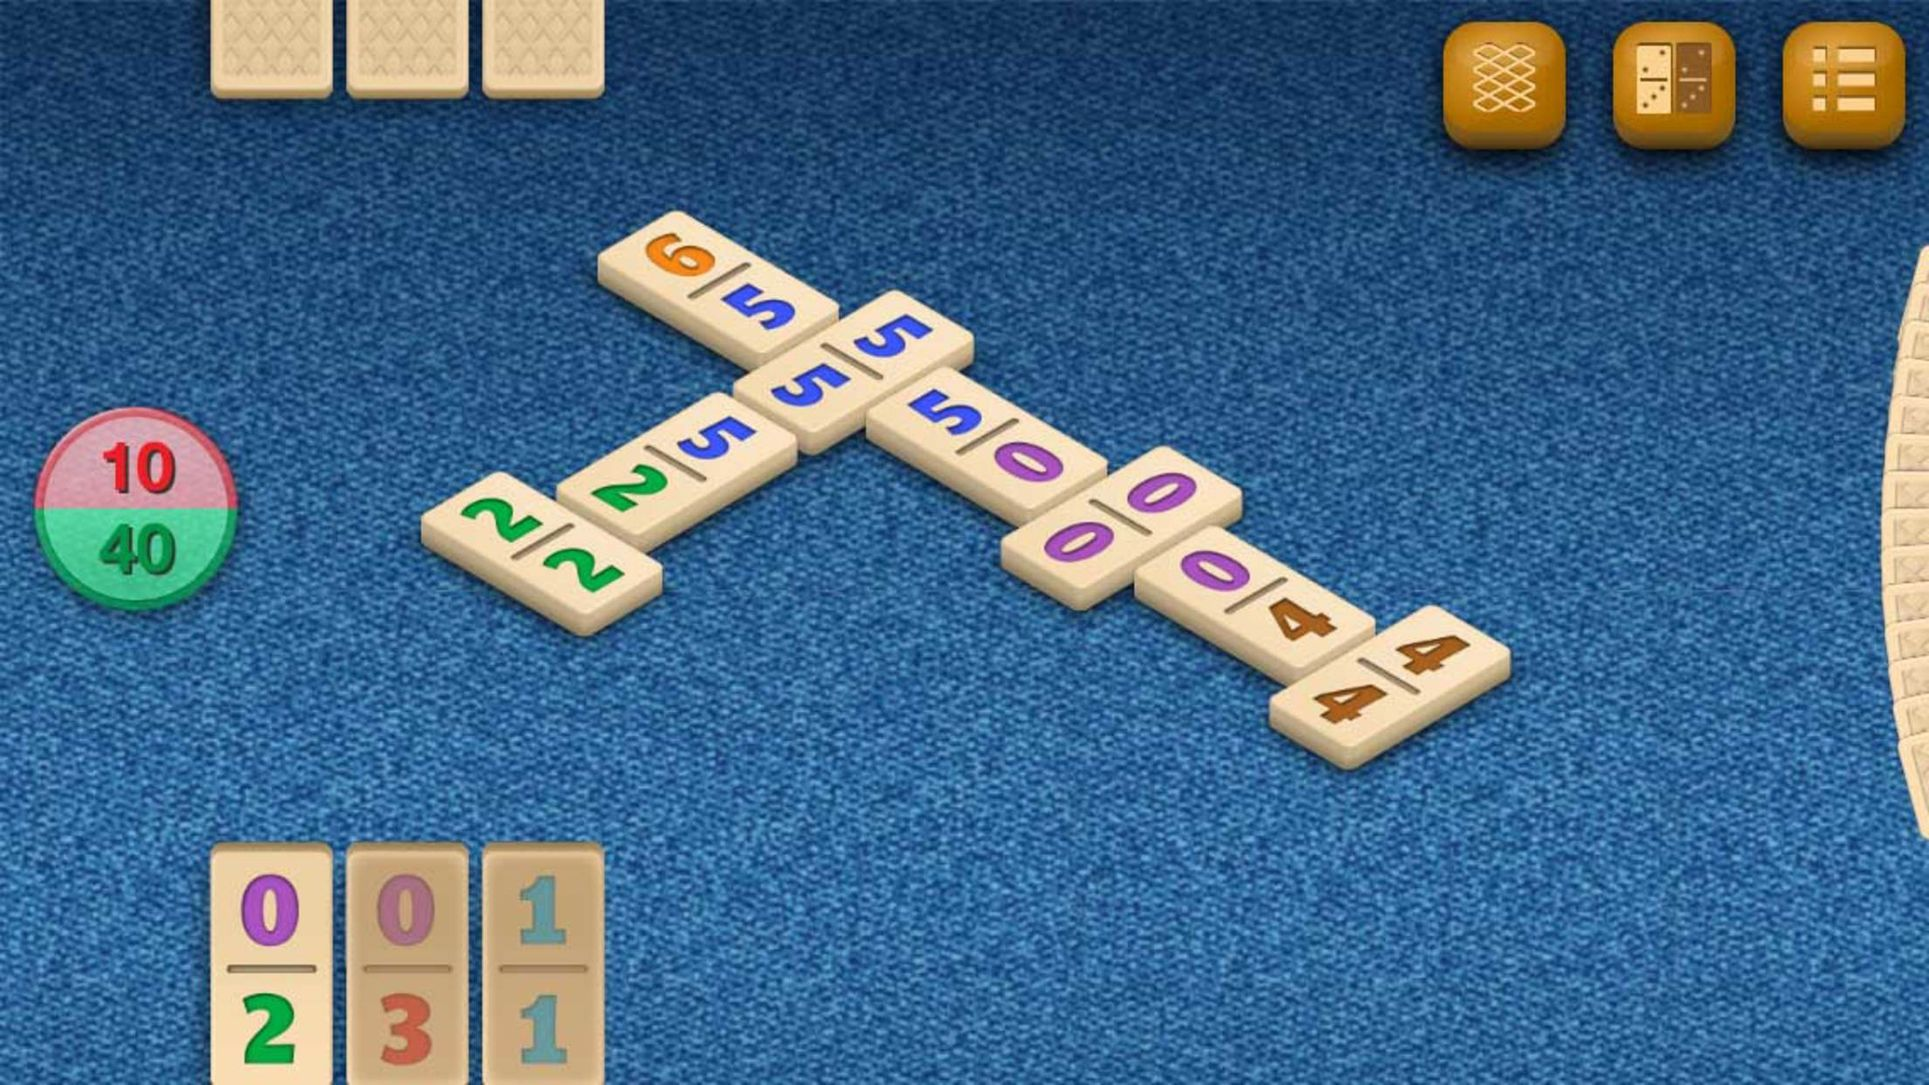 Dominos familyentertainmentappsios ios apps domino app